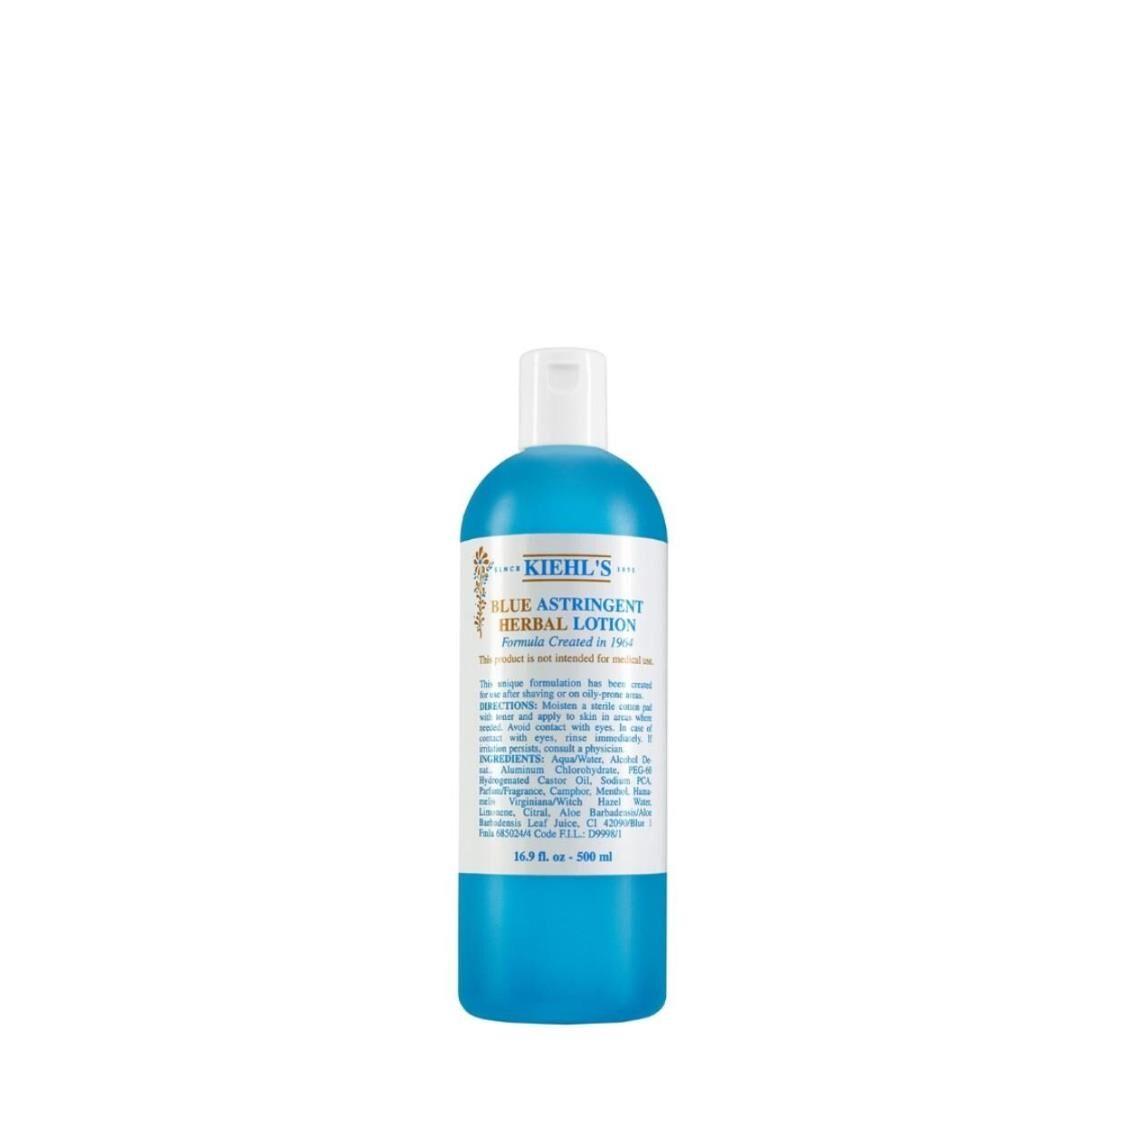 Kiehls Since 1851 Blue Astringent Herbal Lotion 500ml